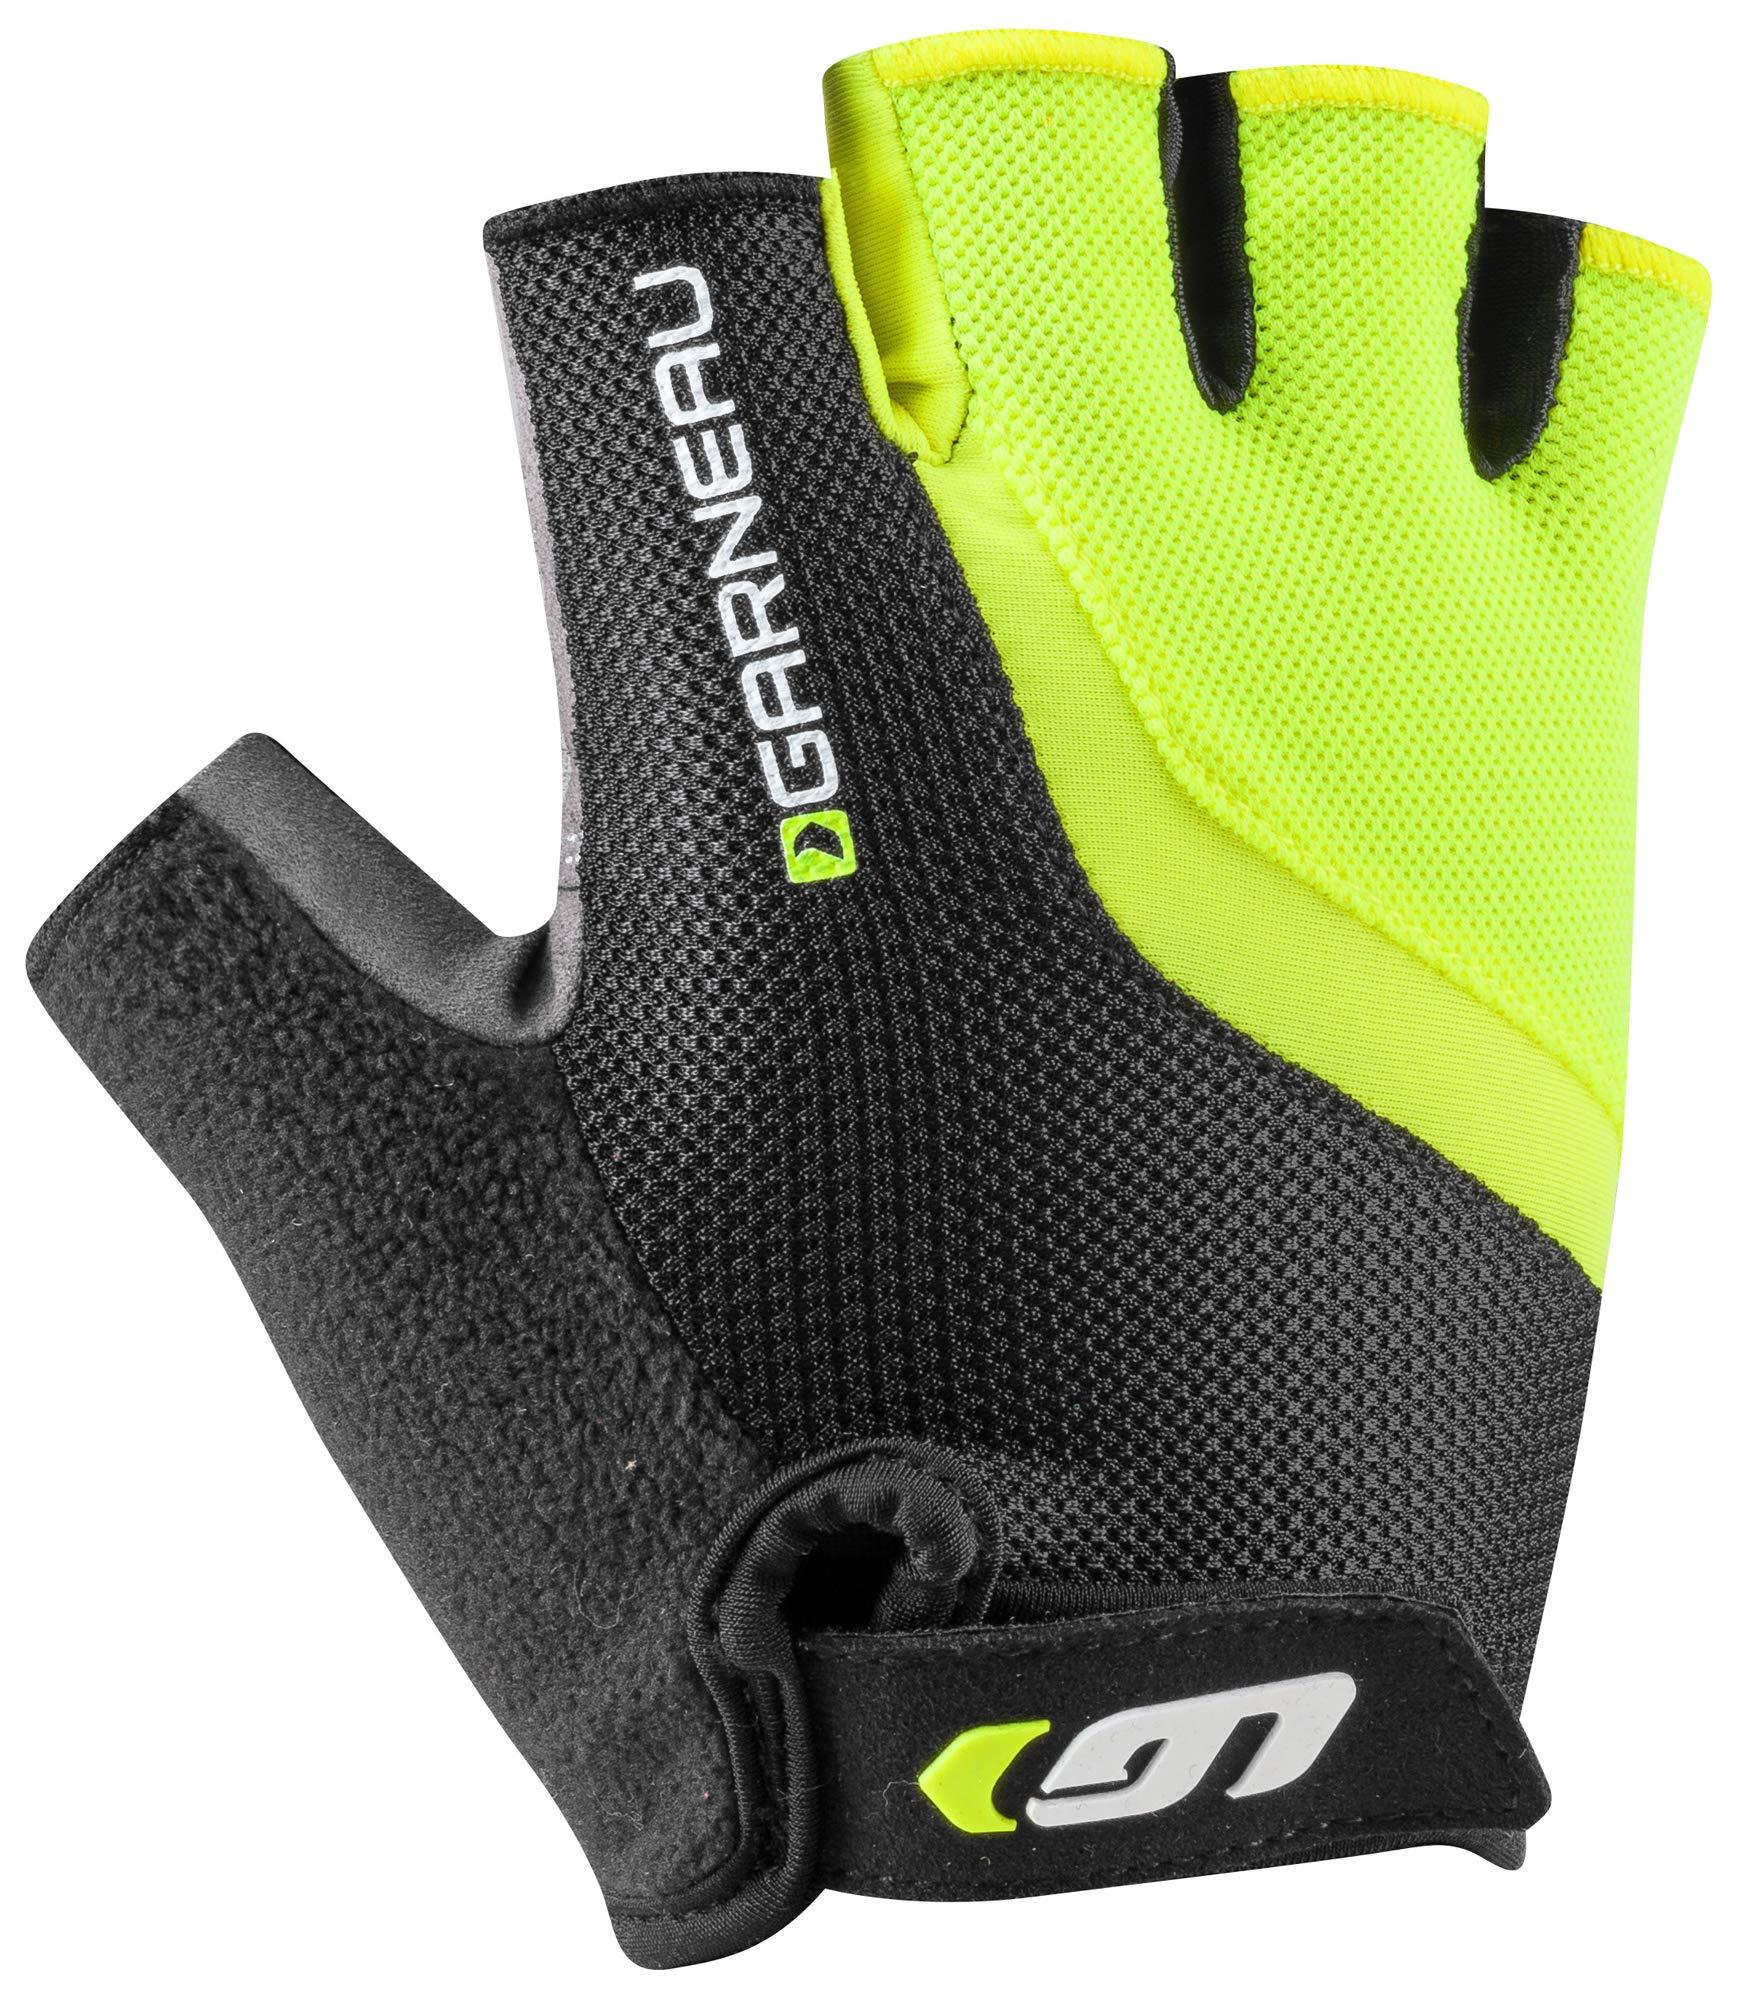 Louis Garneau Men's Biogel RX-V Bike Gloves, Bright Yellow, X-Small